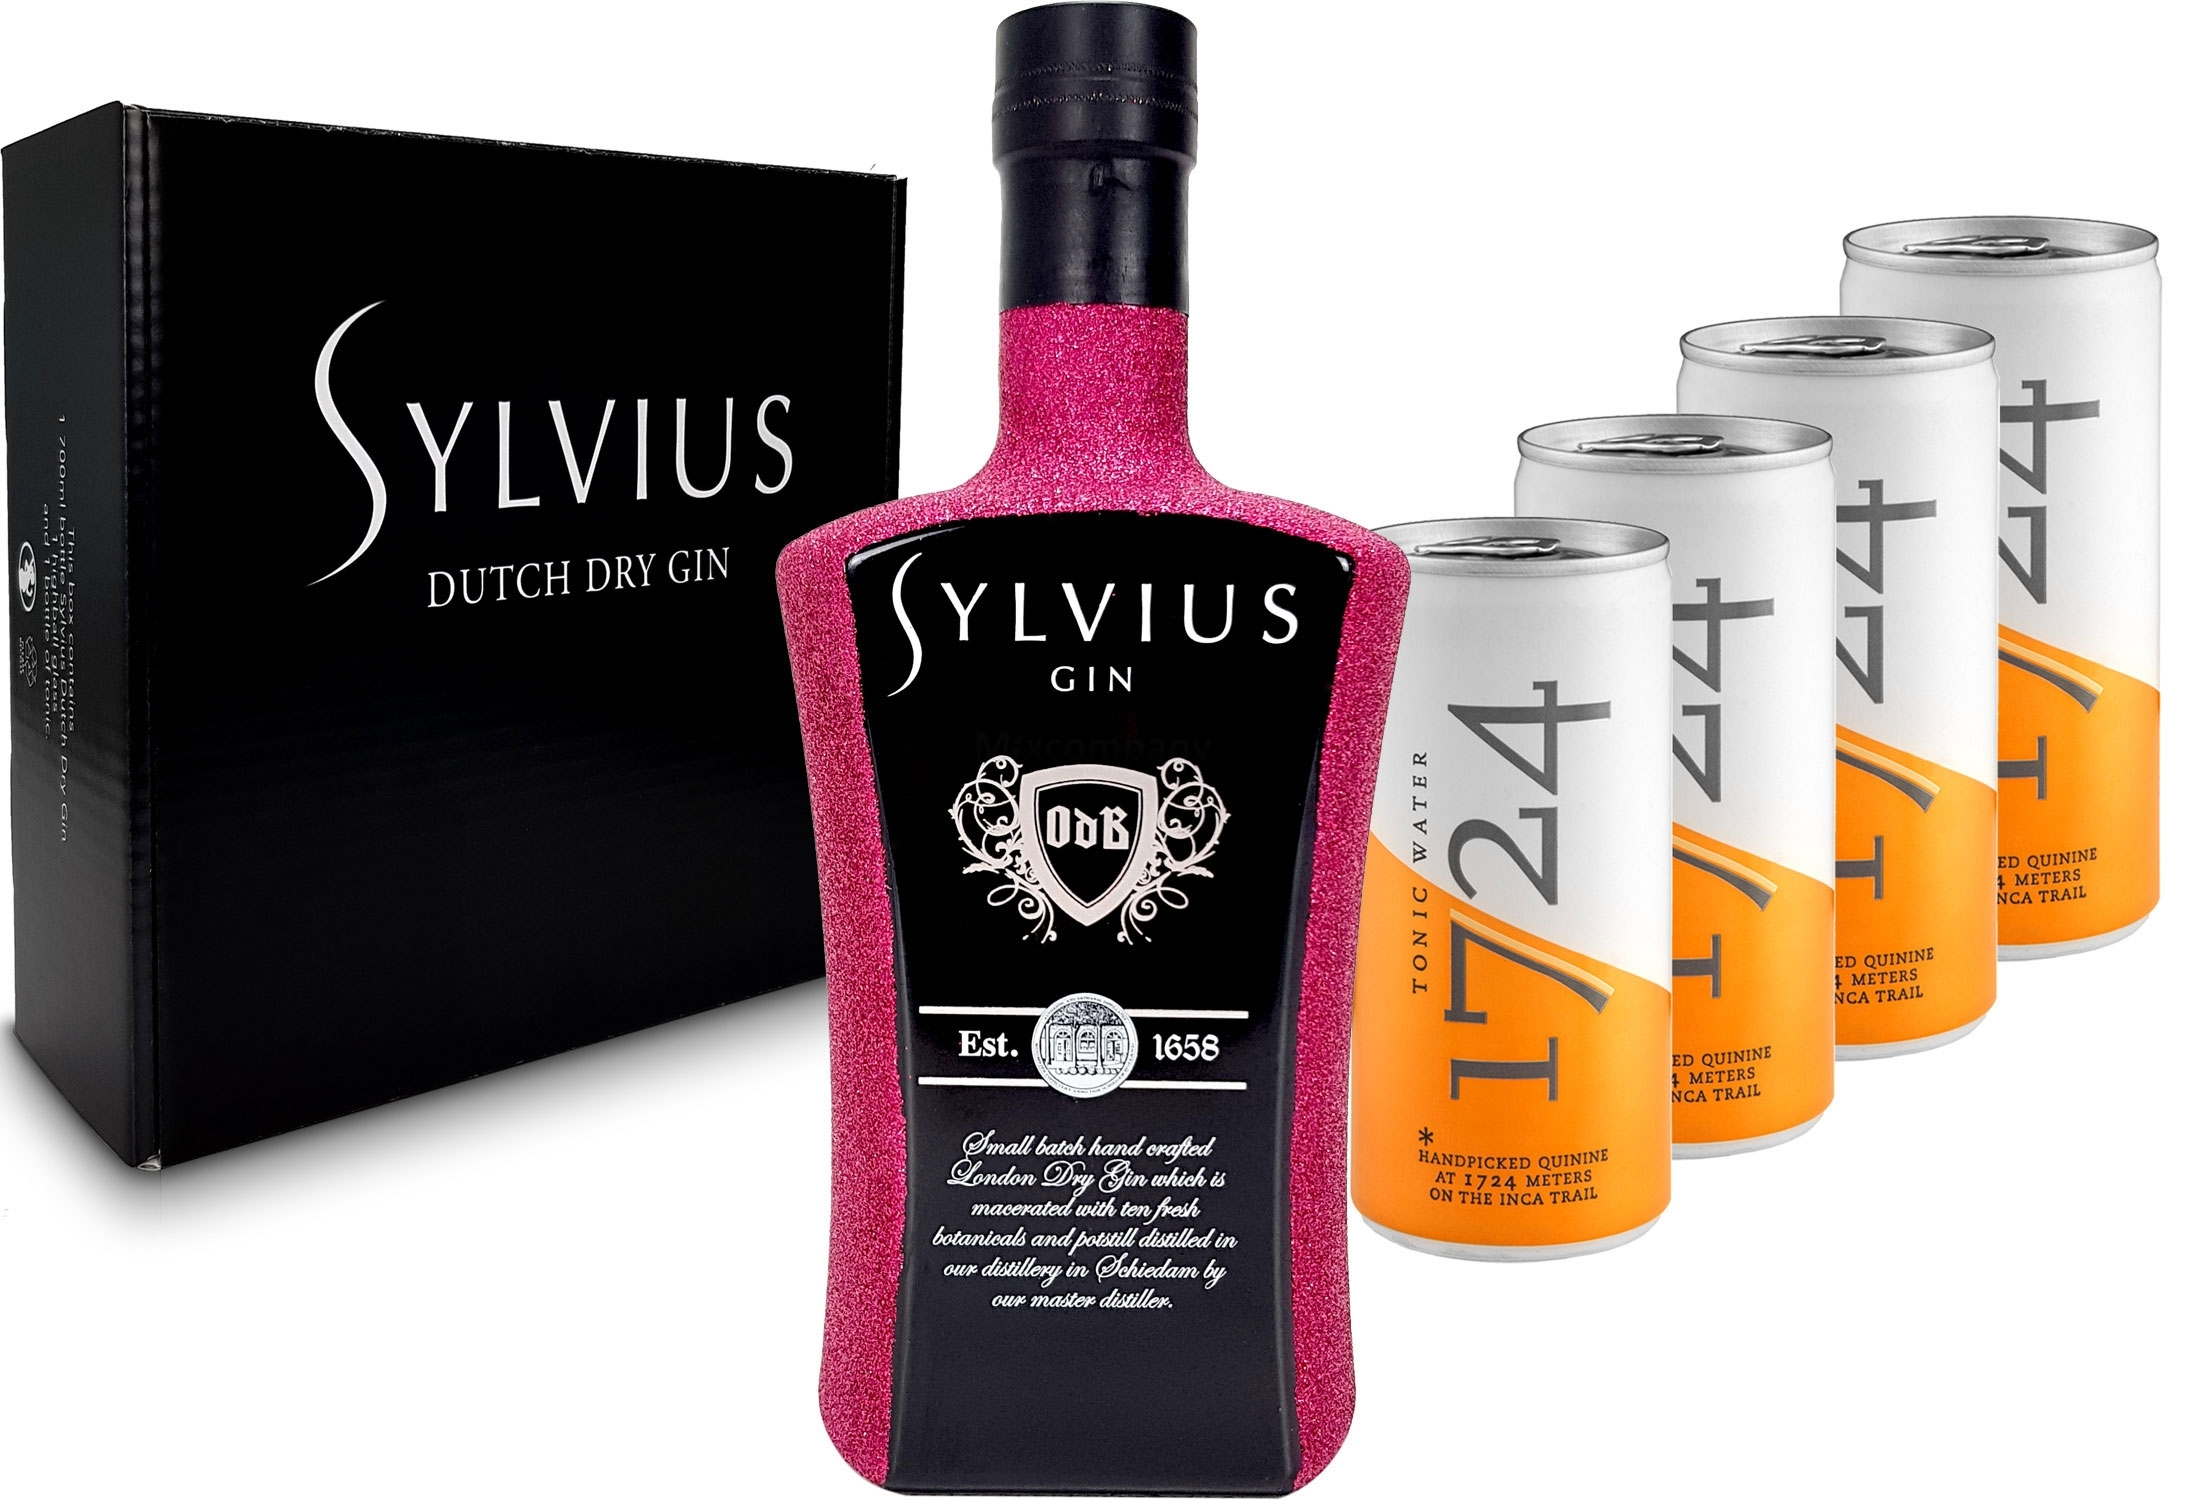 Gin Tonic Bling Bling Hot Pink Glitzer Set Geschenkset - Sylvius Dutch Gin 0,7l 700ml (45% Vol) + 4x 1724 Tonic Water Dosen 200ml inkl. Pfand EINWEG -[Enthält Sulfite]